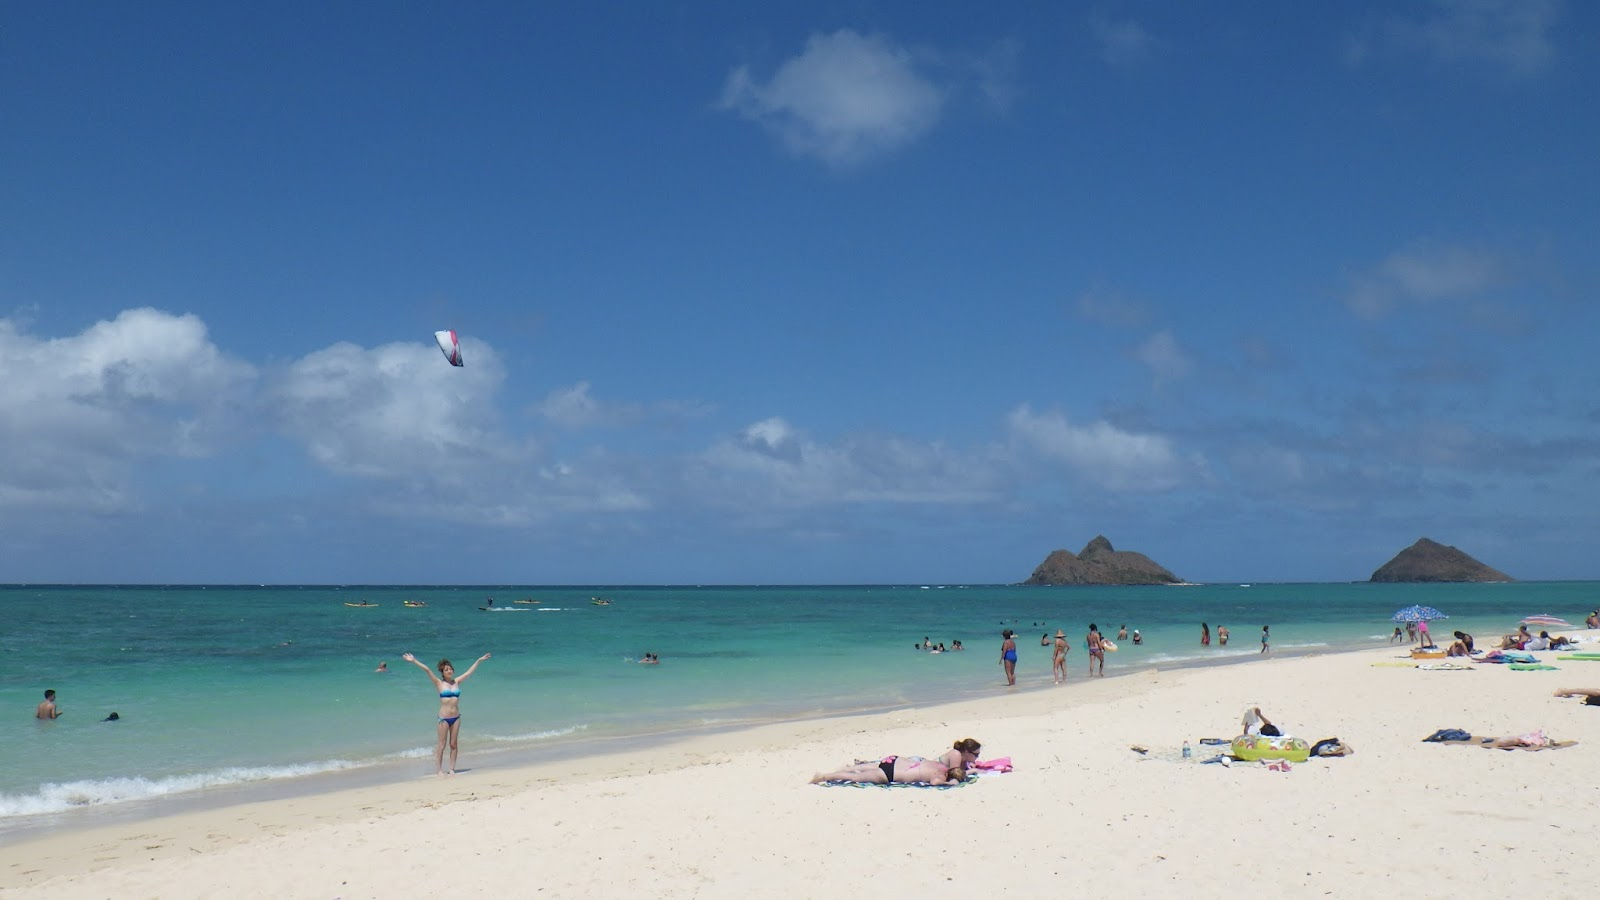 Frogma Hawaii 2015 Day 4 Part 2 A Nice Assortment Of Stuffs